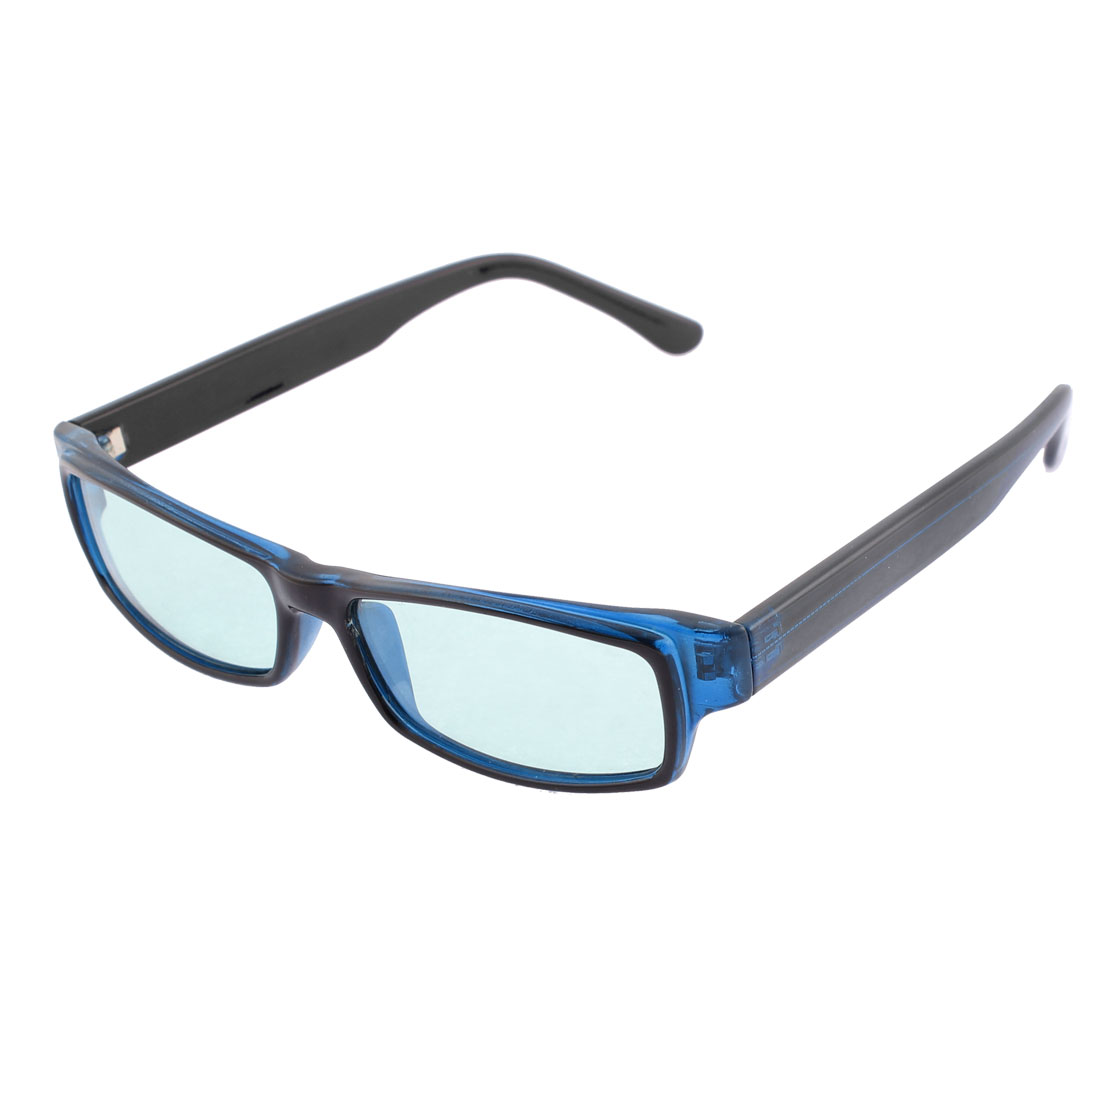 Single Bridge Green Lens Outdoor Glasses Sunglasses Eyes Protector